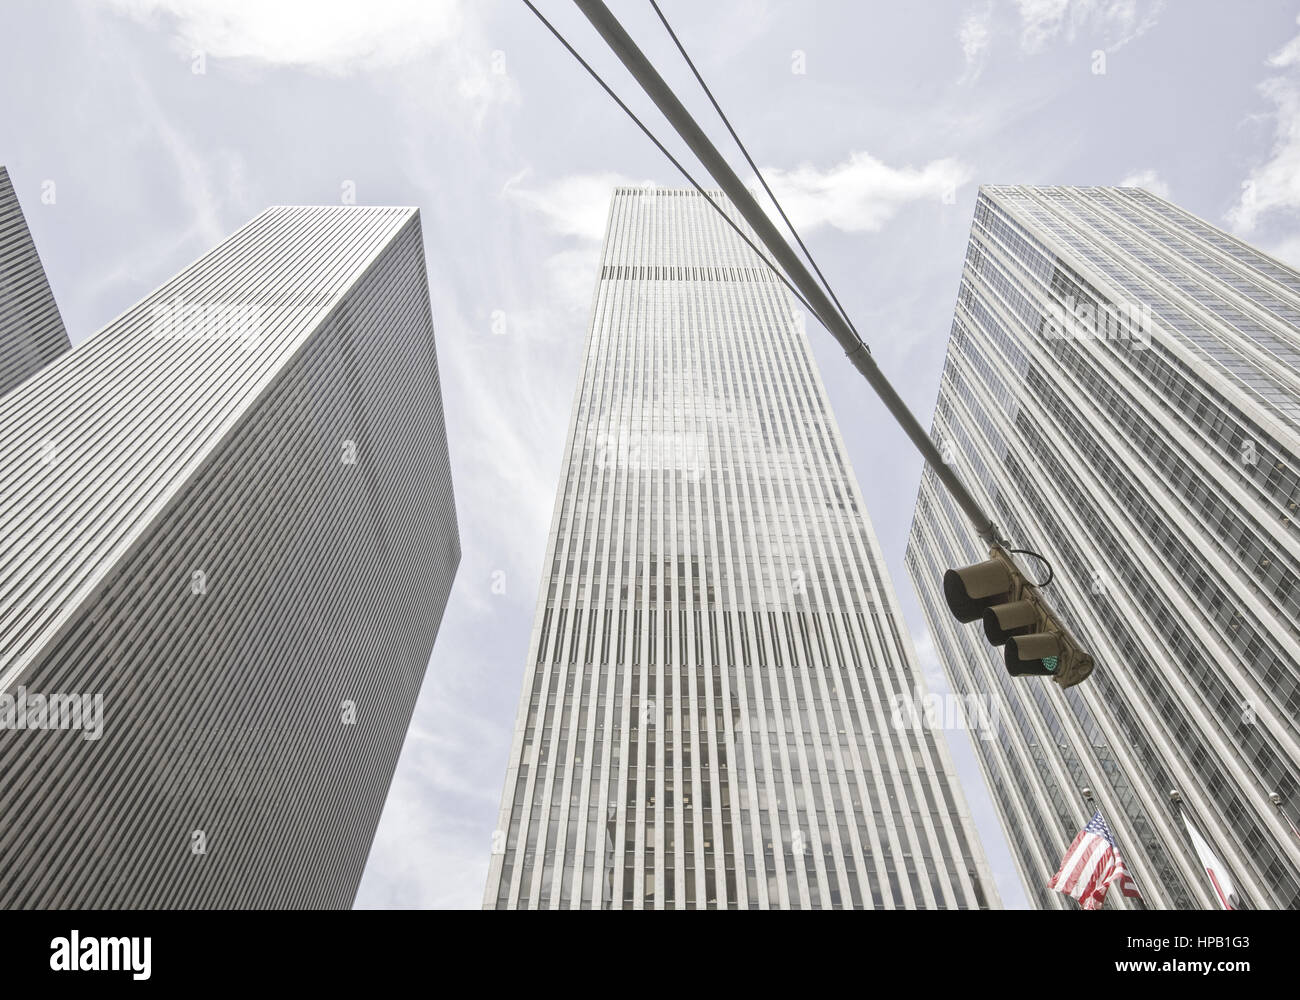 Wolkenkratzer in New York, USA - Stock Image